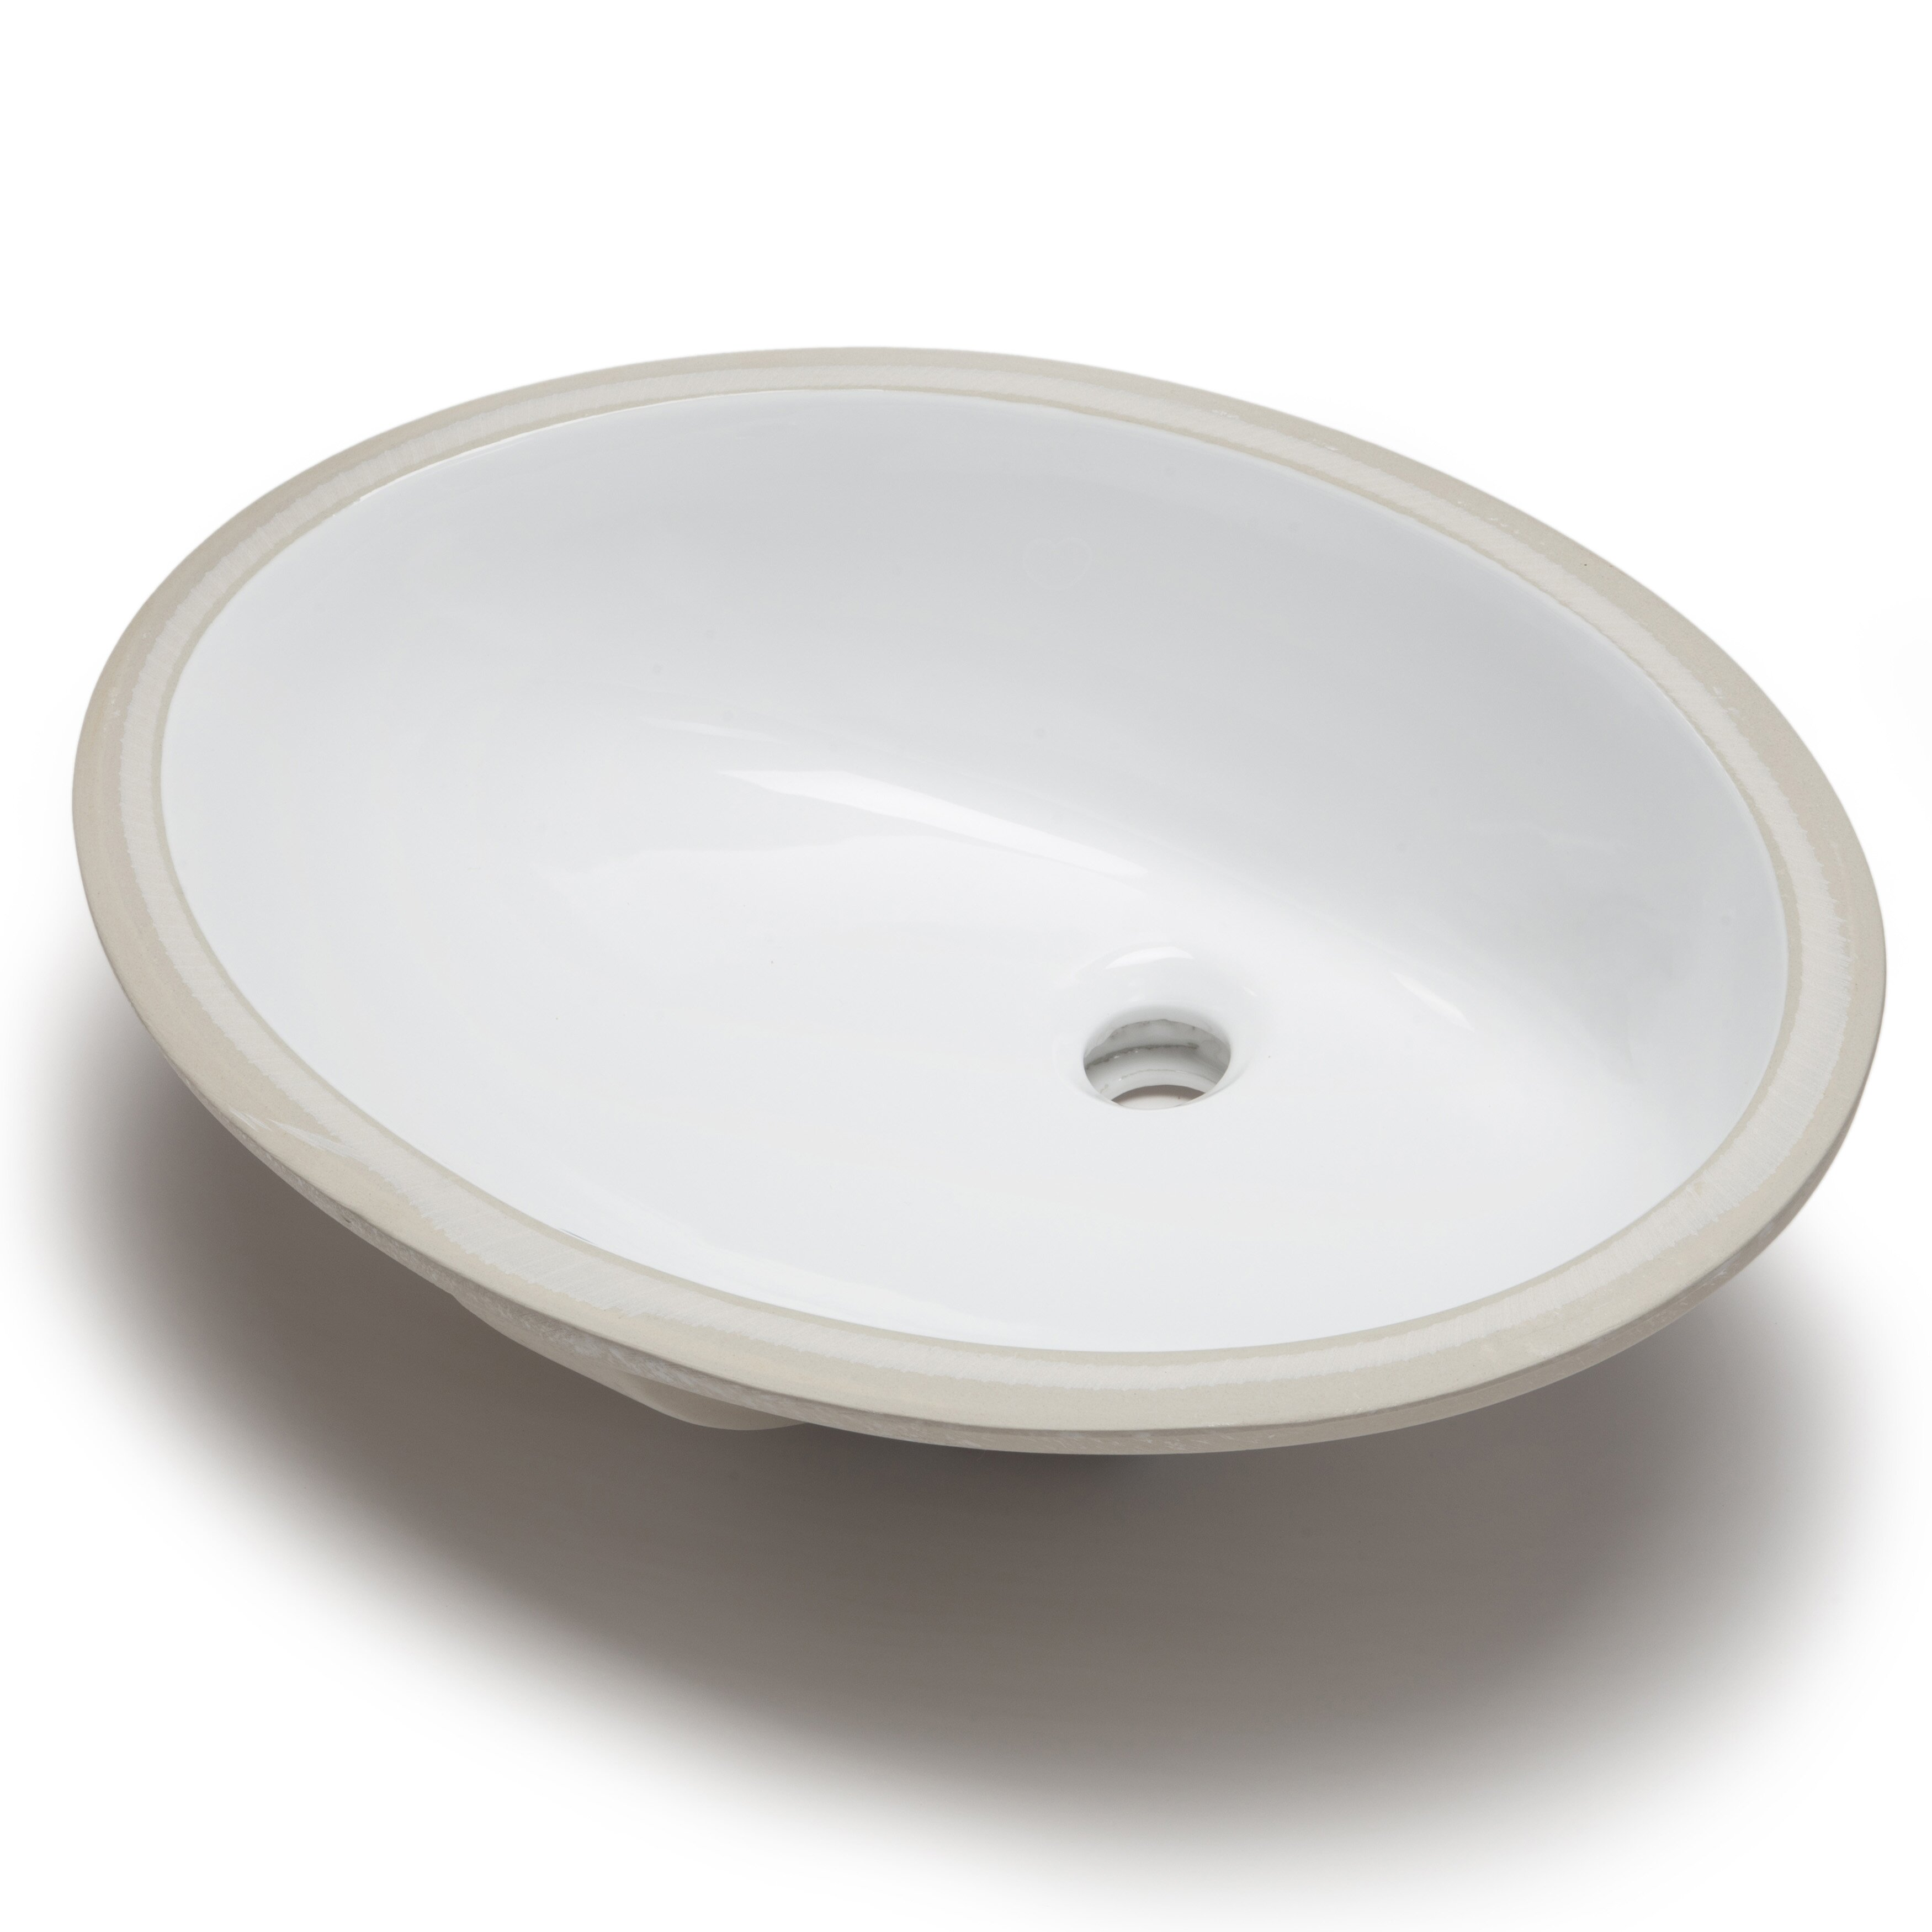 Hahn Ceramic Bowl Oval Undermount Bathroom Sink With Overflow Wayfair